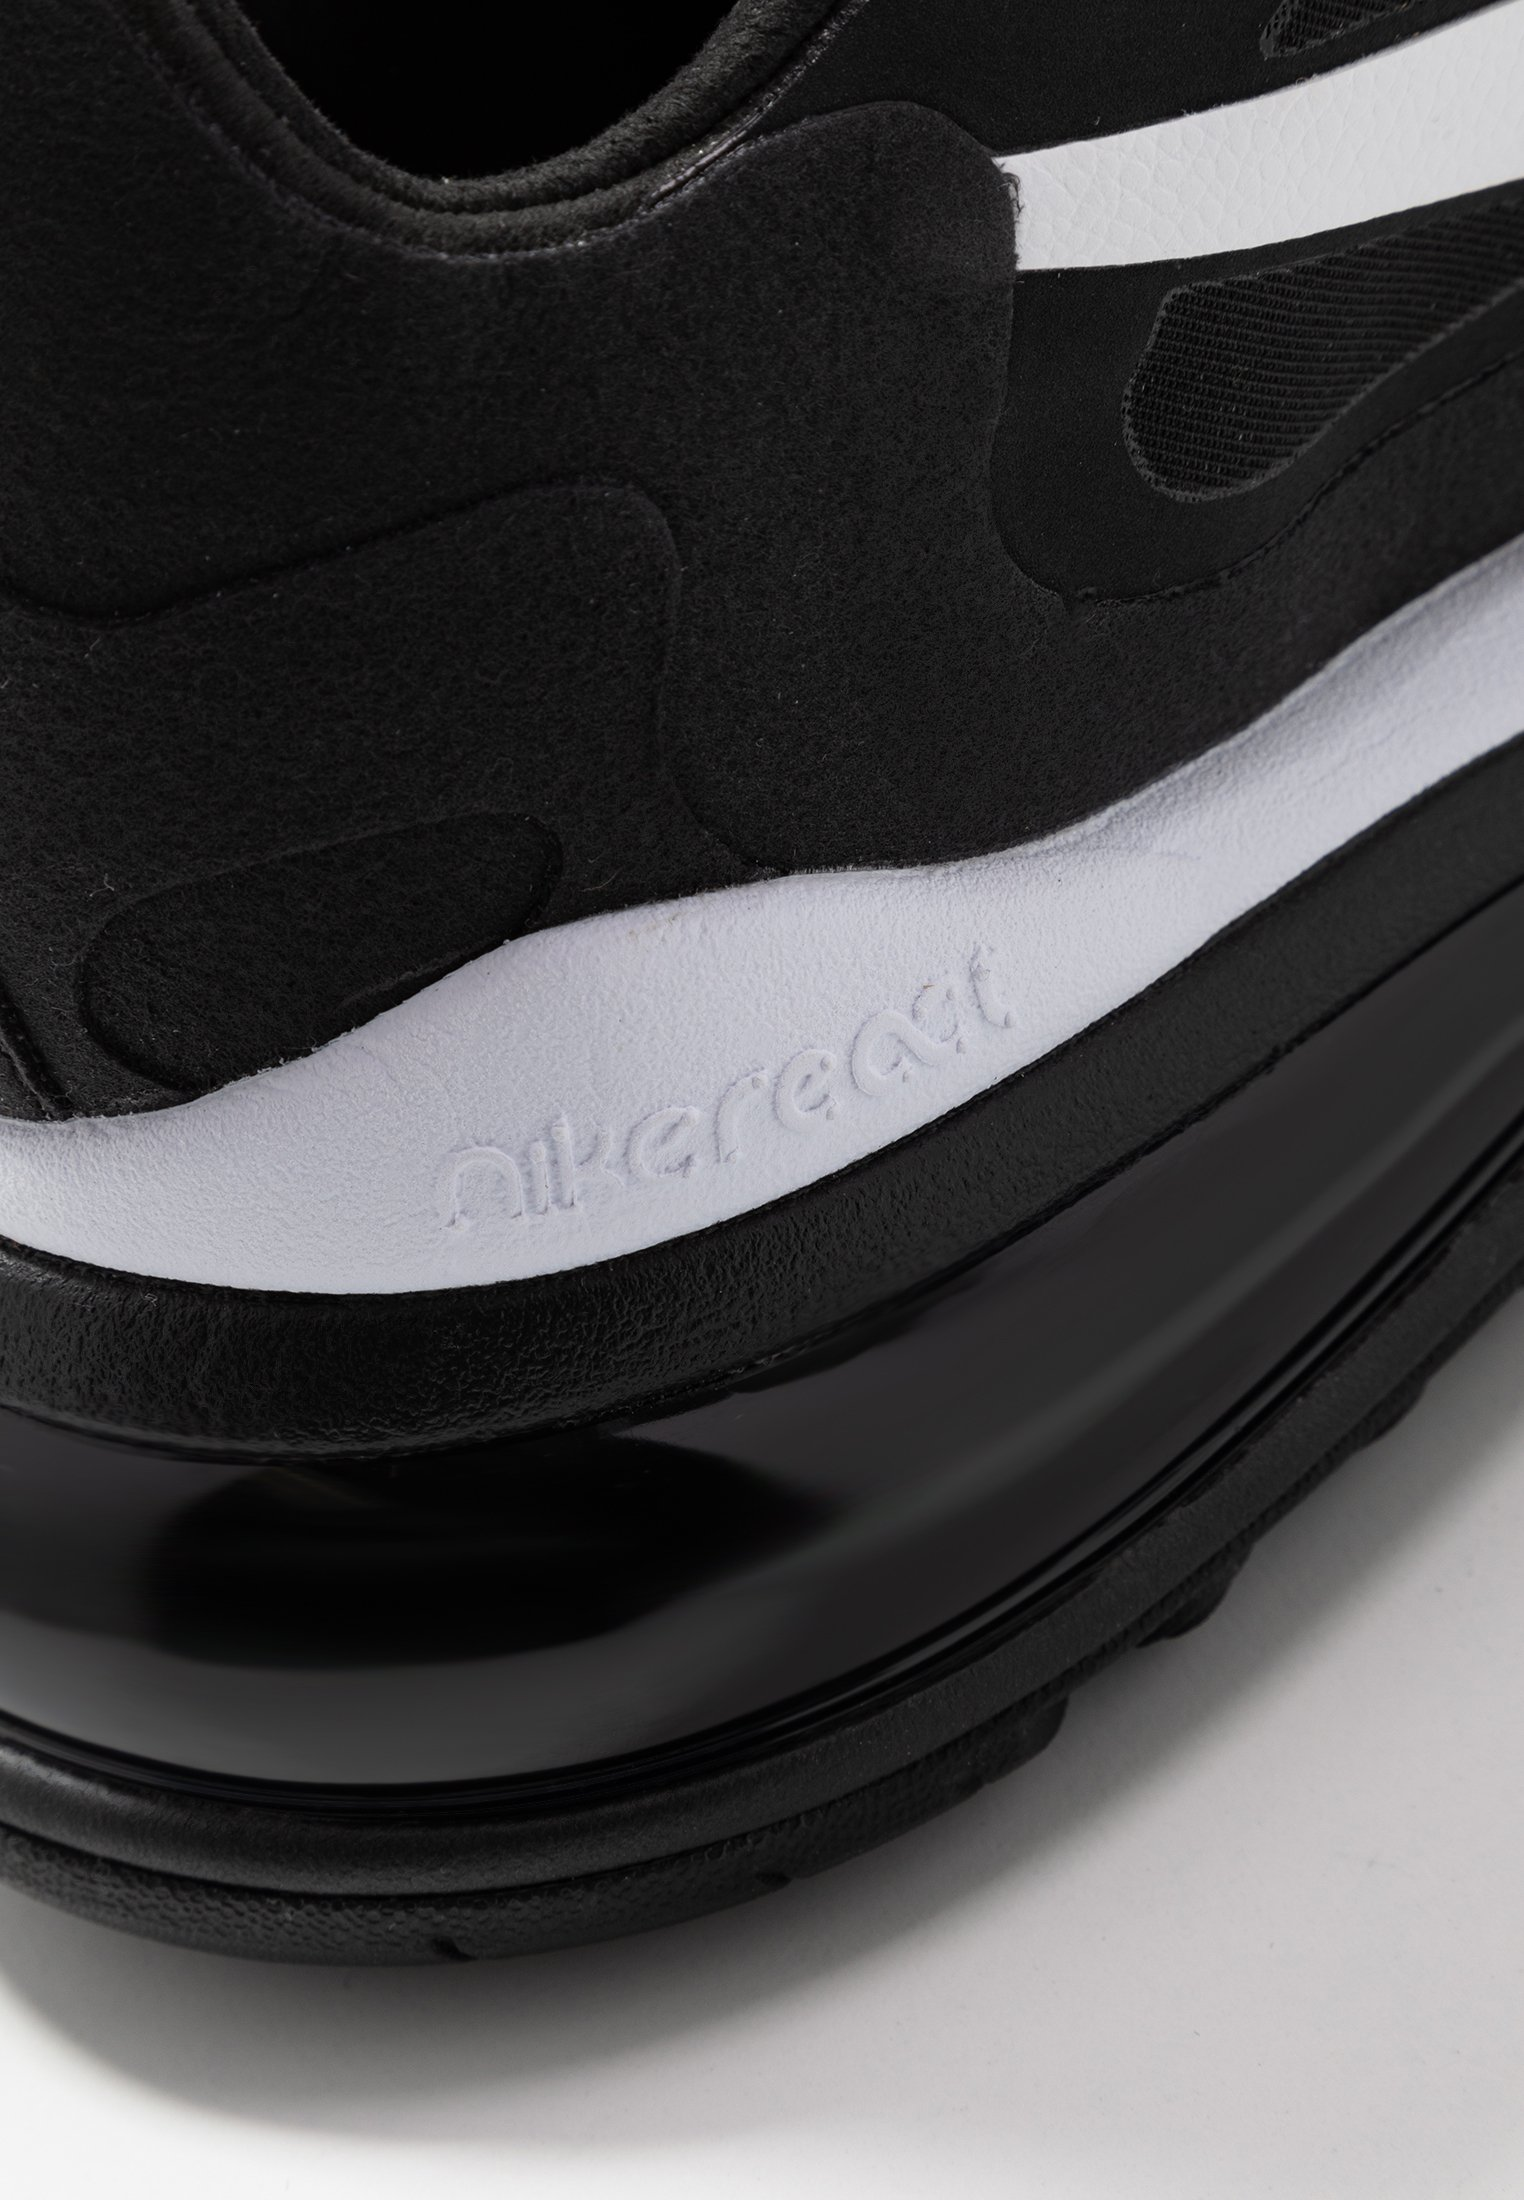 Nike Sportswear Air Max 270 React - Sneakers Black/white